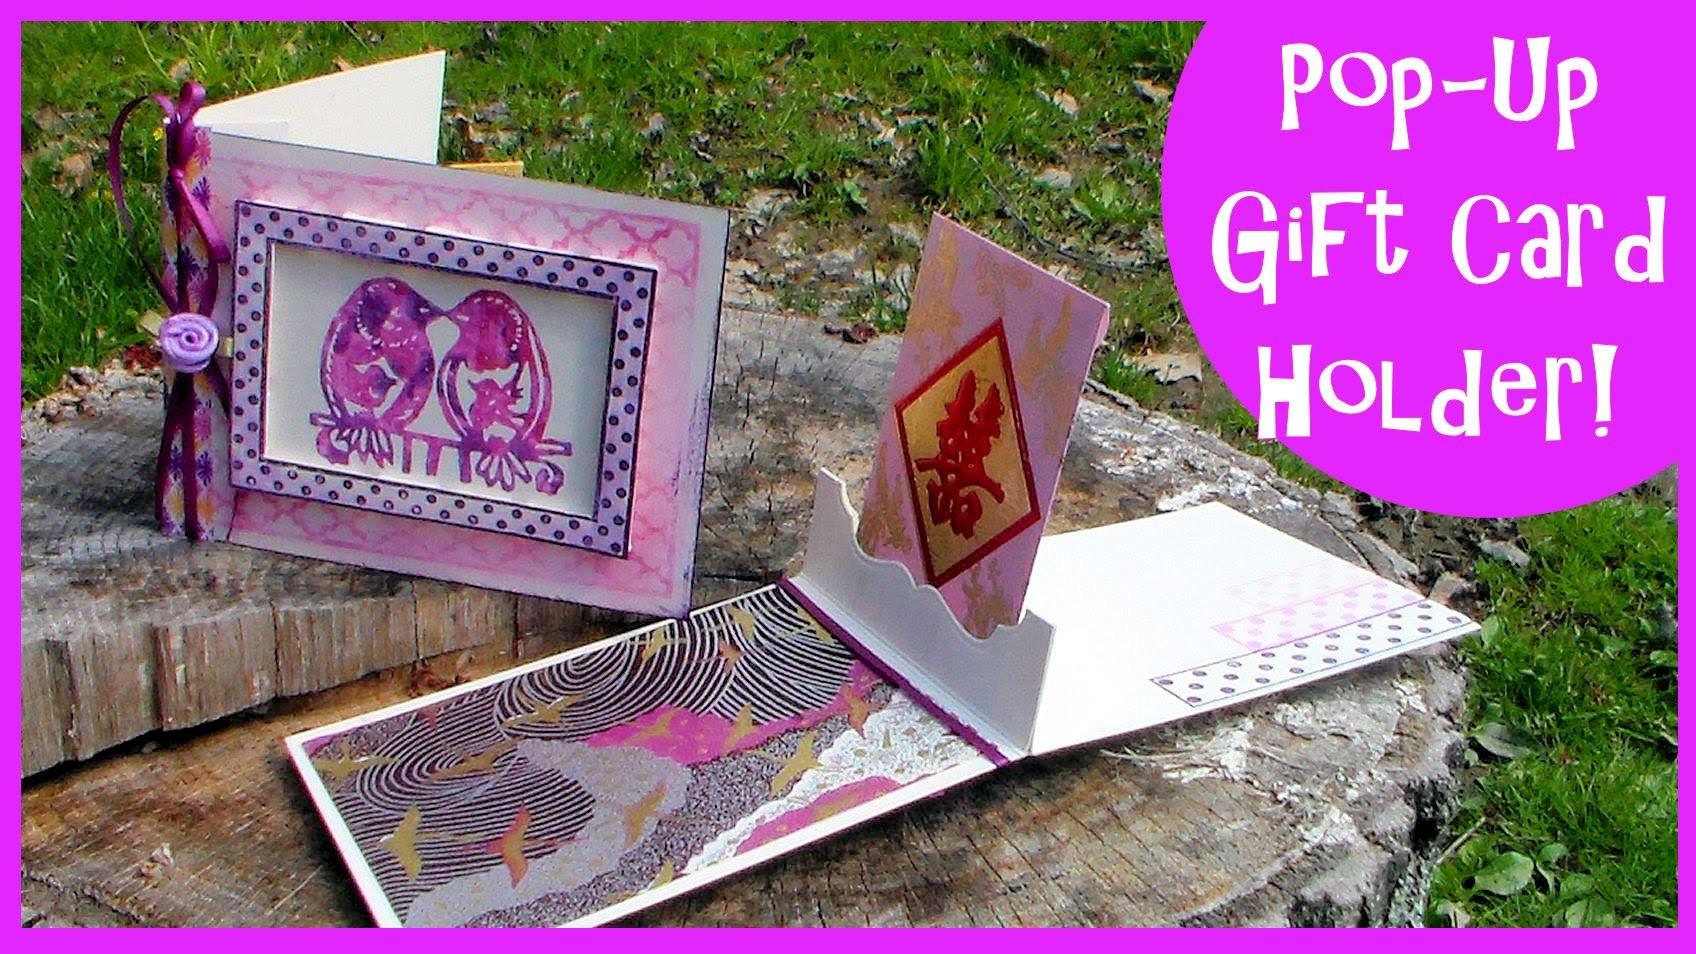 Pop-Up Gift Card Holder. Stamp School